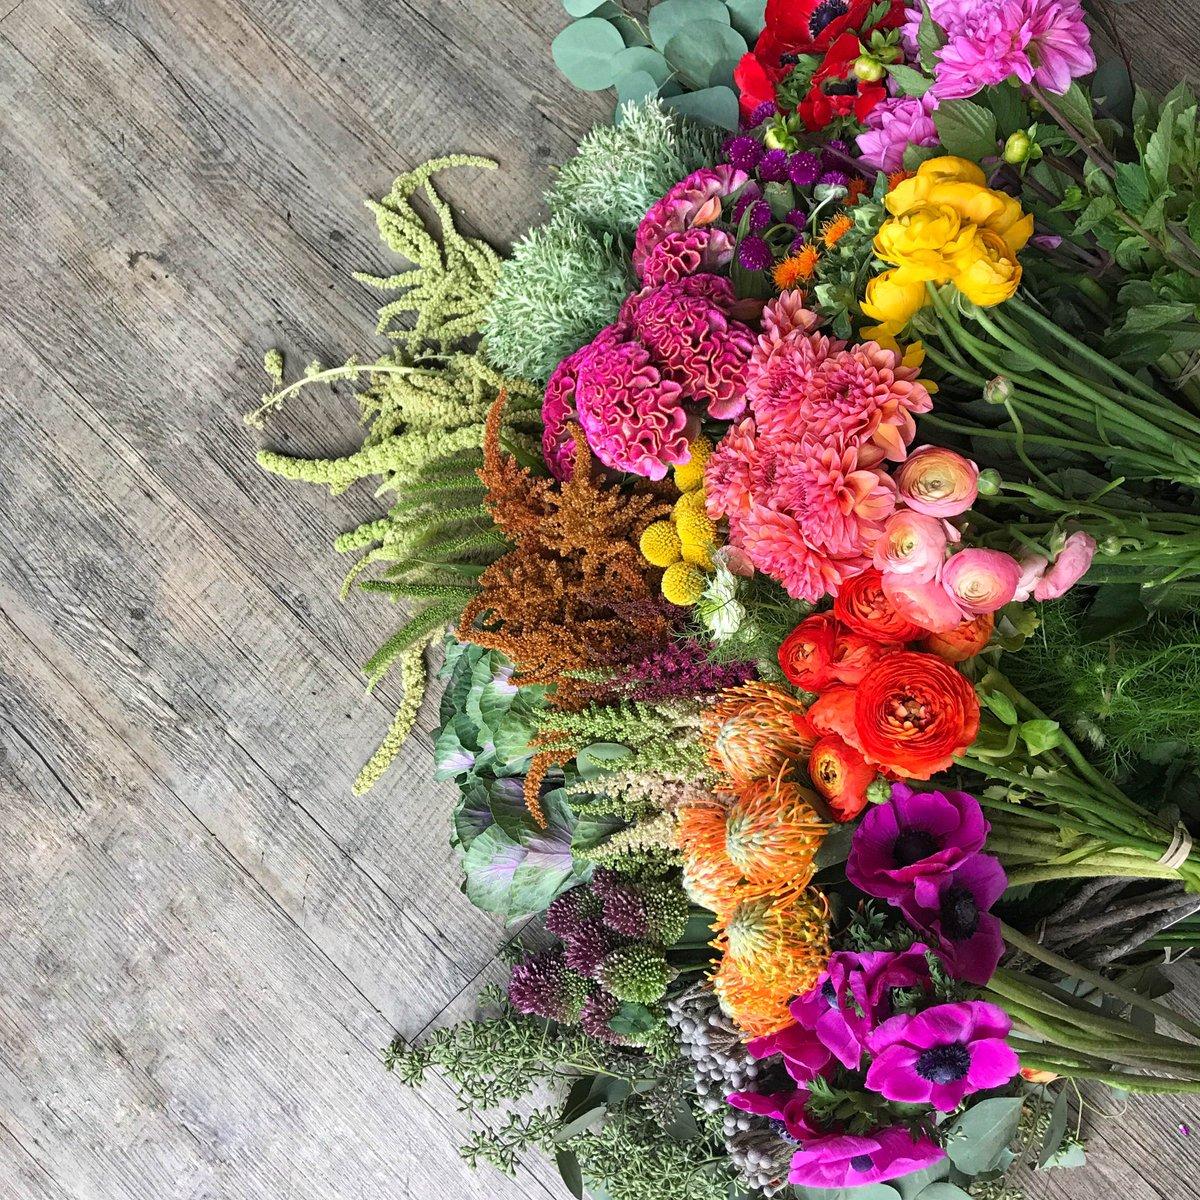 Osteria posto on twitter fall showers bring beautiful fall osteria posto on twitter fall showers bring beautiful fall flowers see you for dinner izmirmasajfo